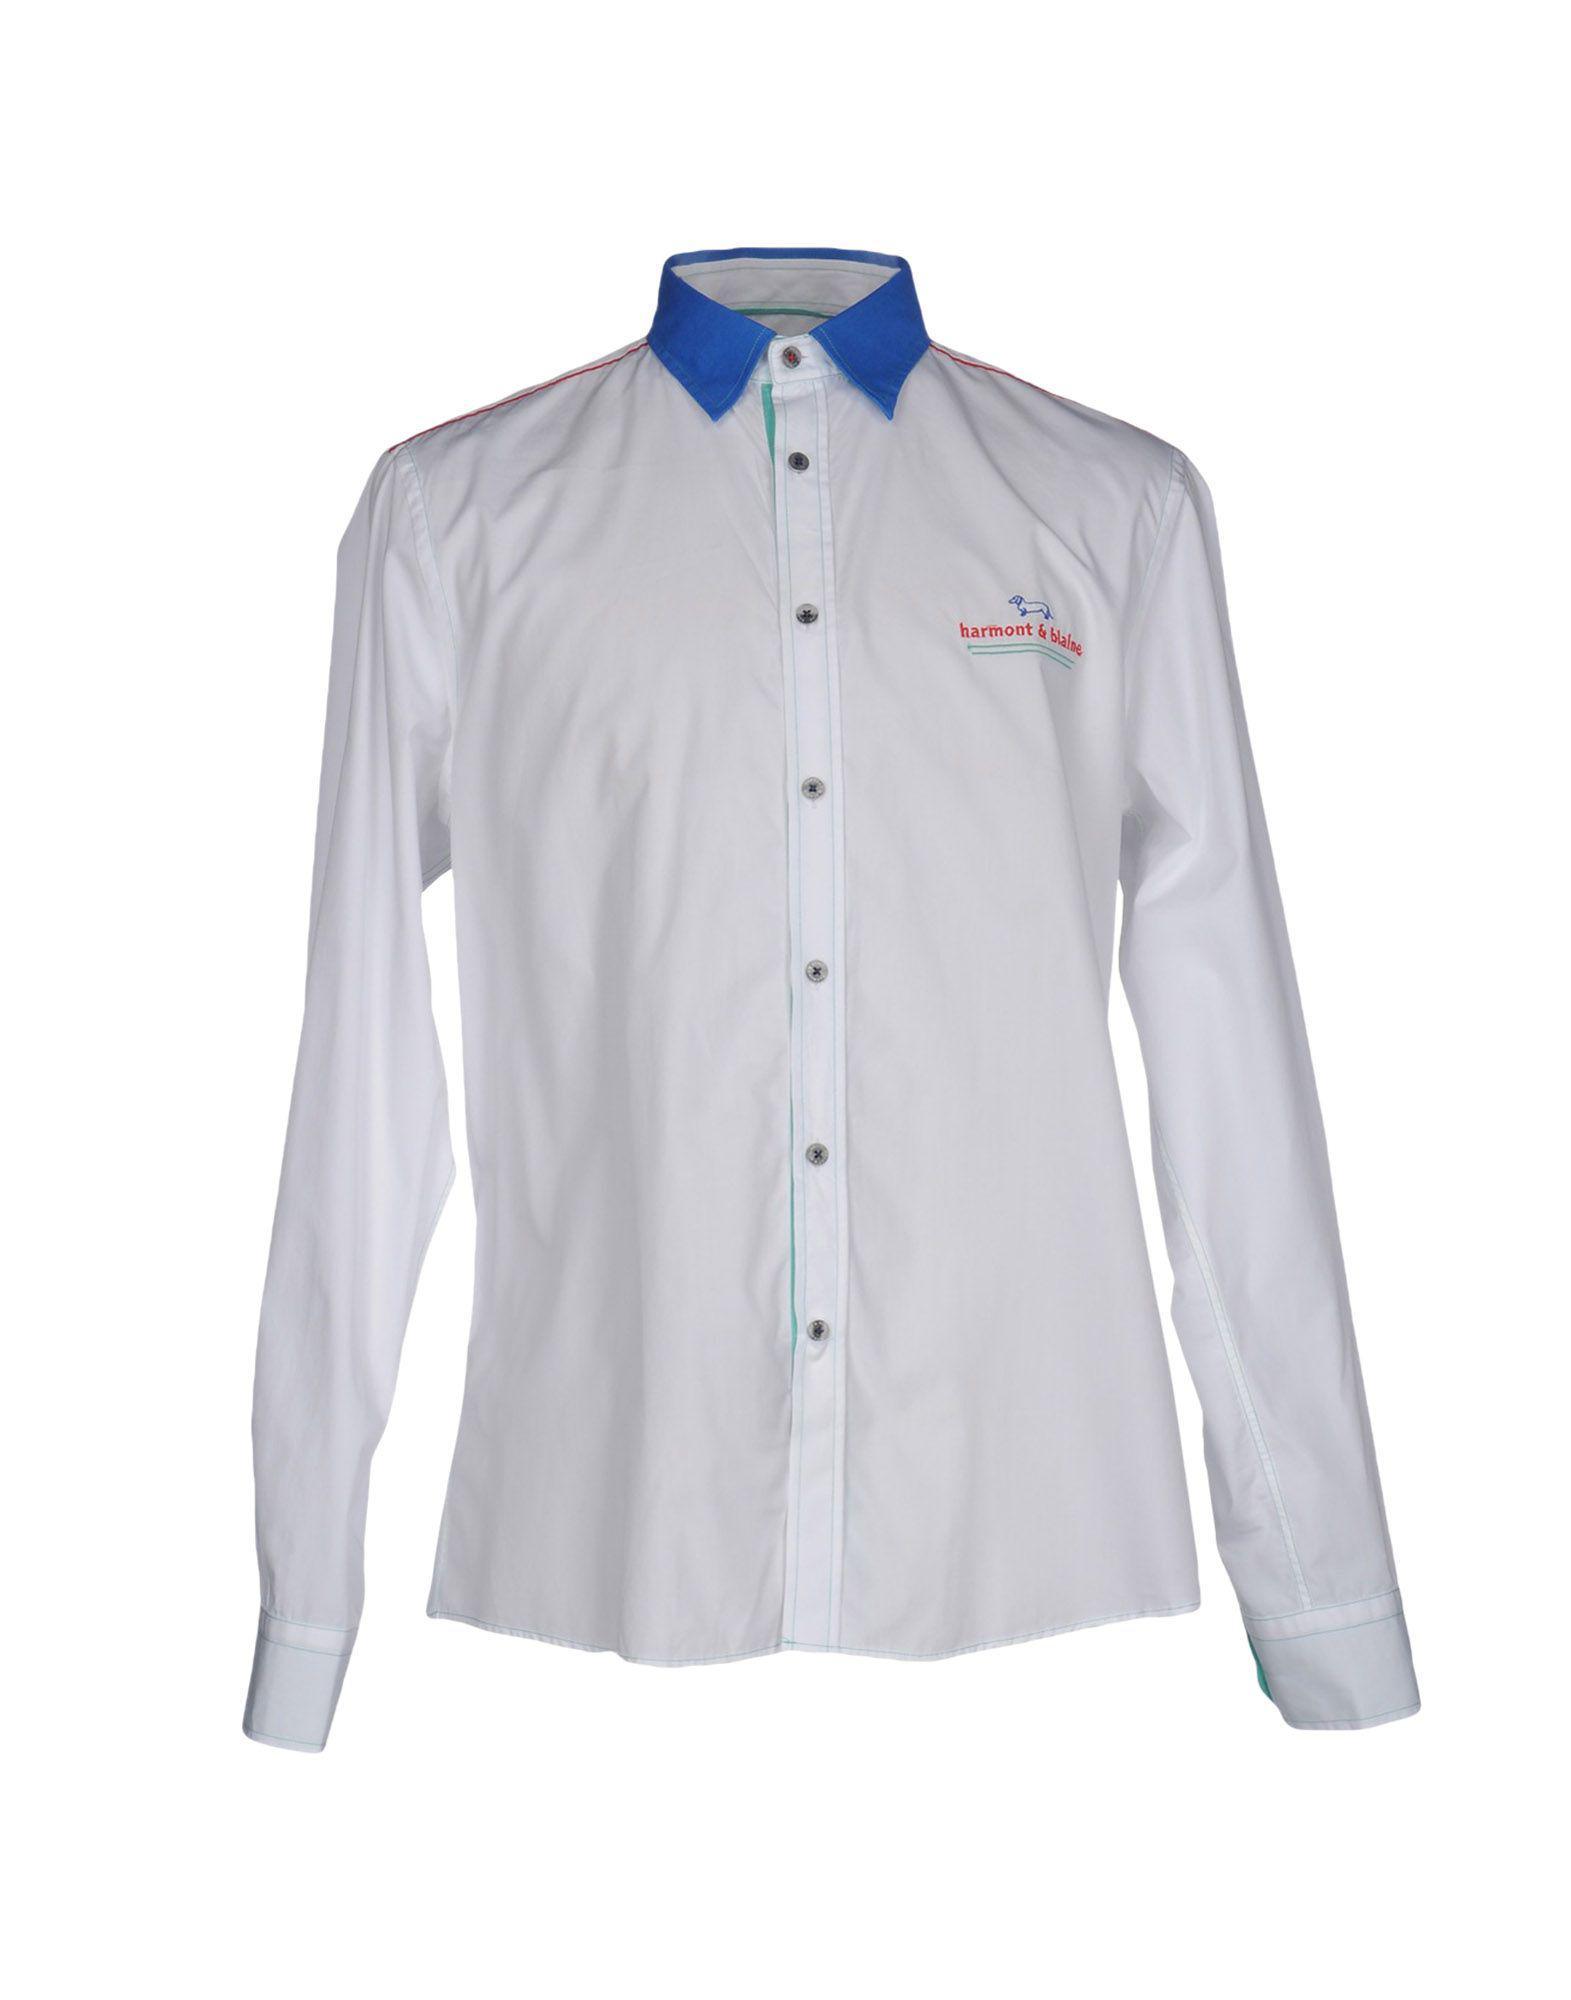 Harmont & Blaine. Men's White Shirt